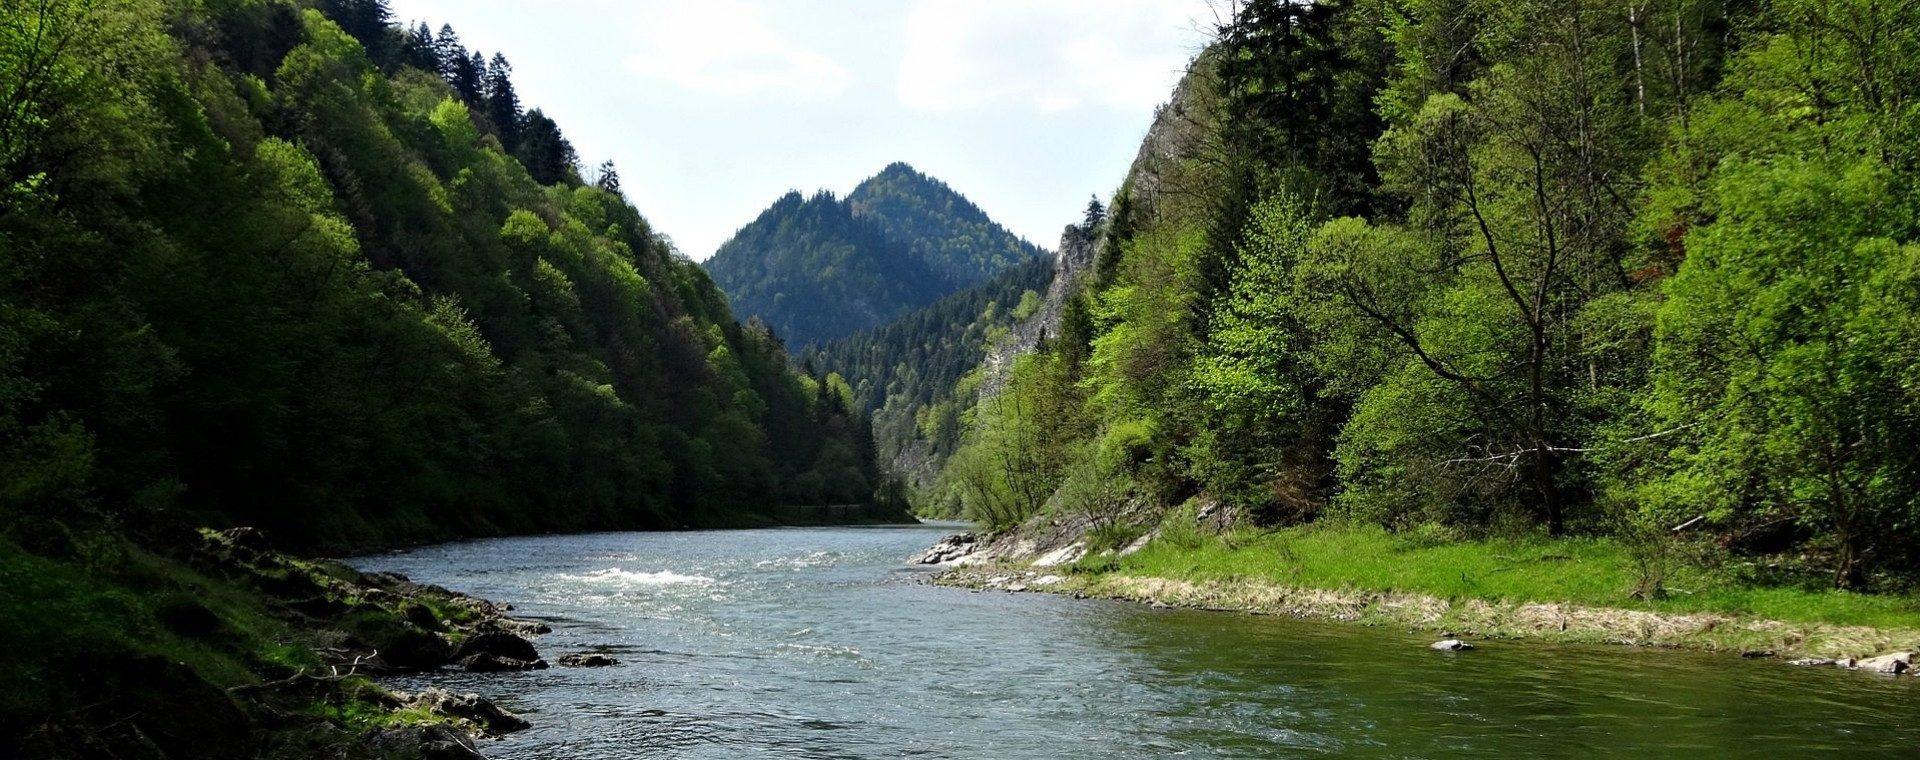 Dunajec rafting - traditional